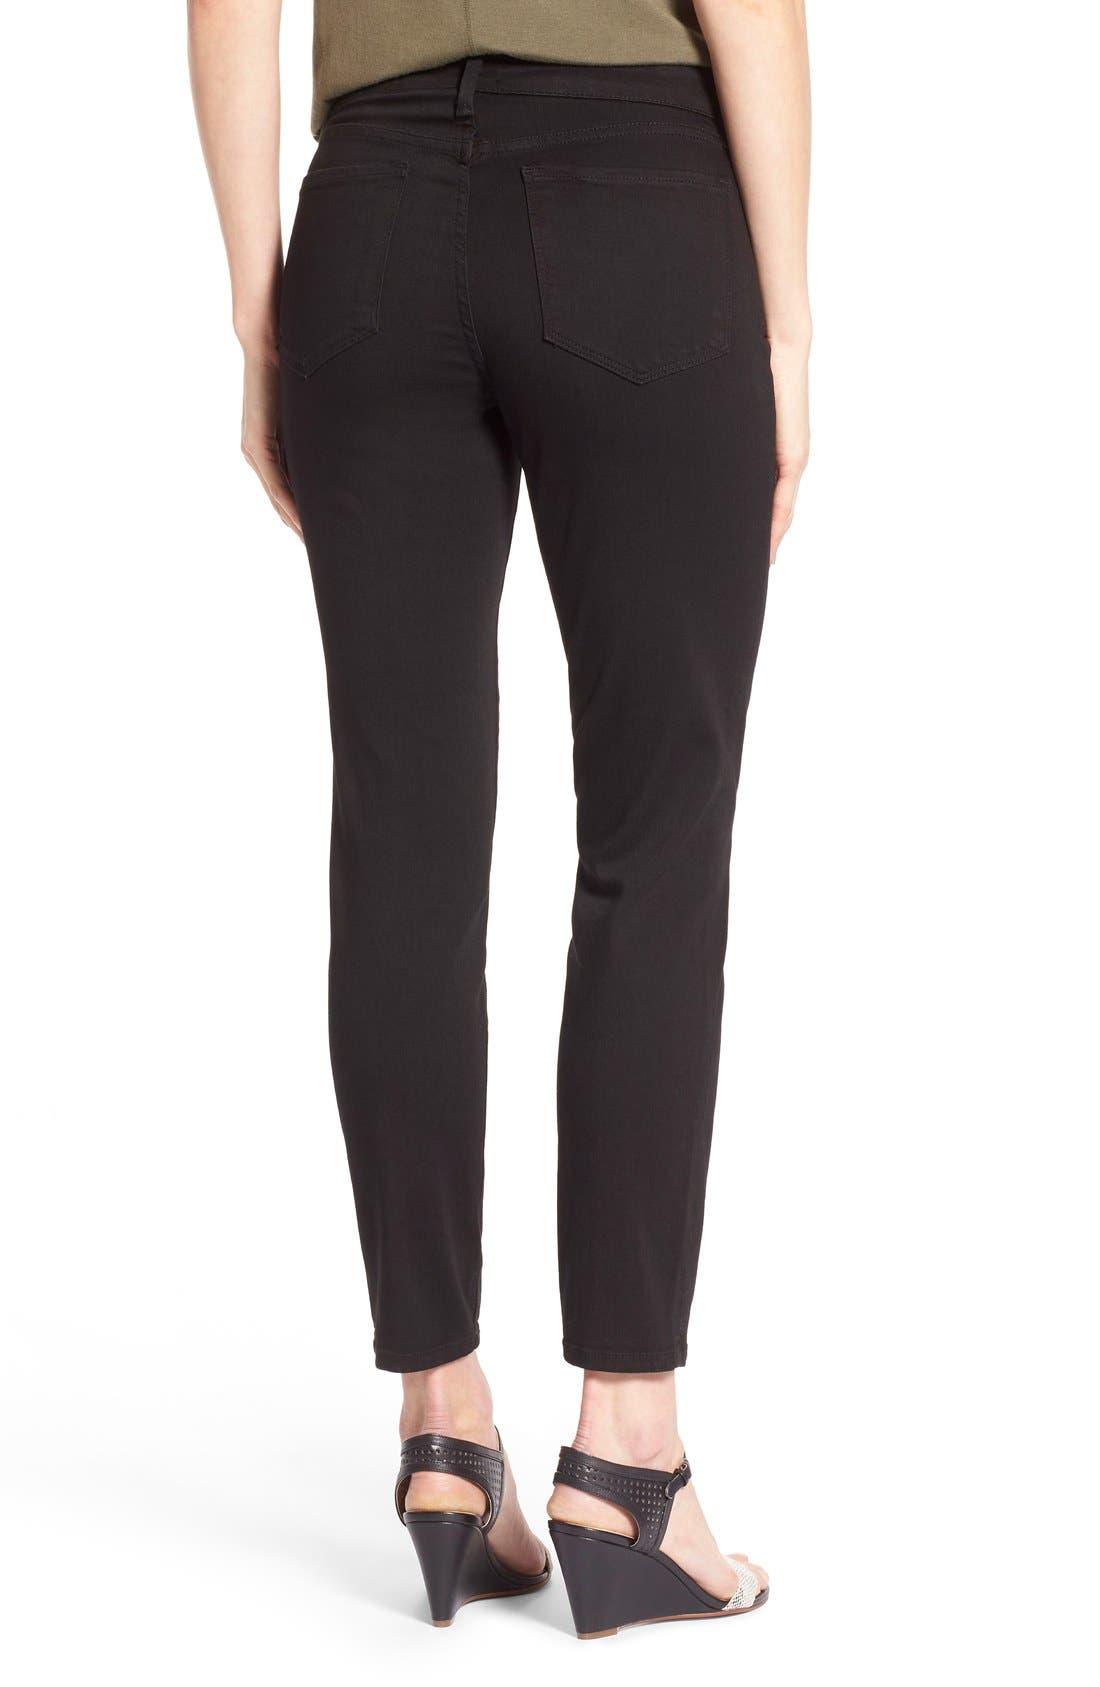 'Clarissa' Stretch Ankle Skinny Jeans,                             Alternate thumbnail 2, color,                             Black Garment Wash